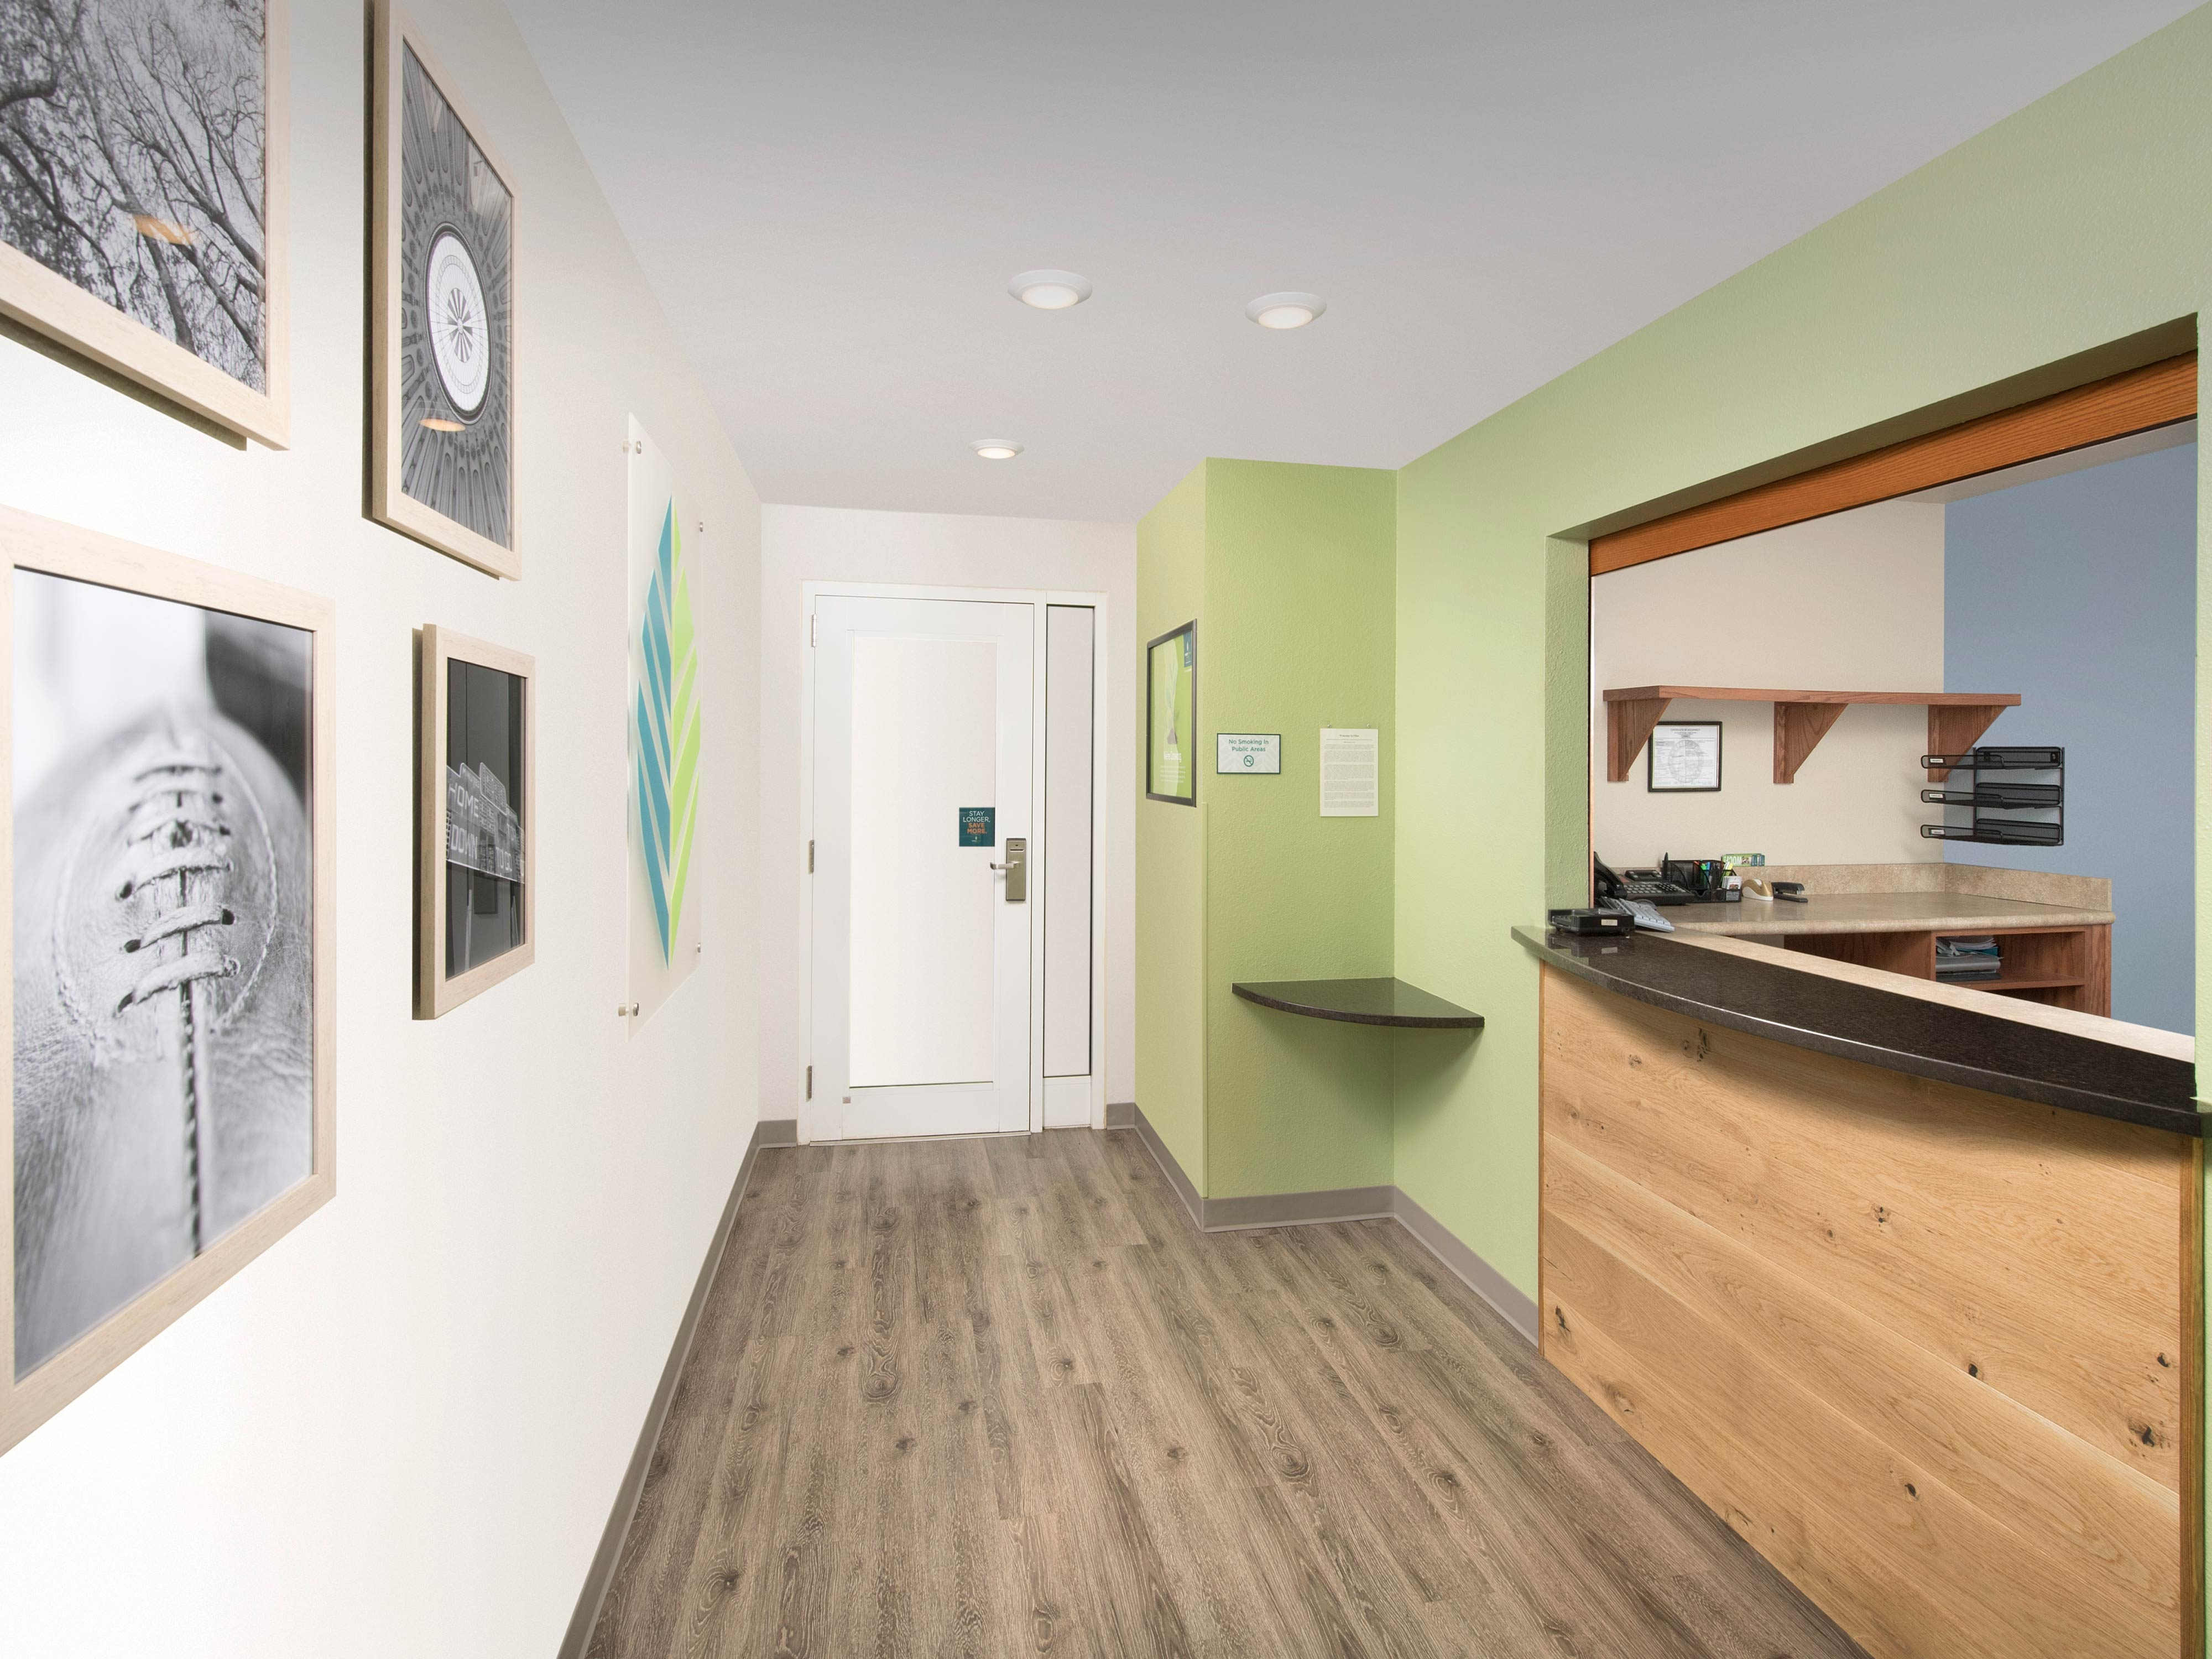 WoodSpring Suites Pensacola Northeast image 16